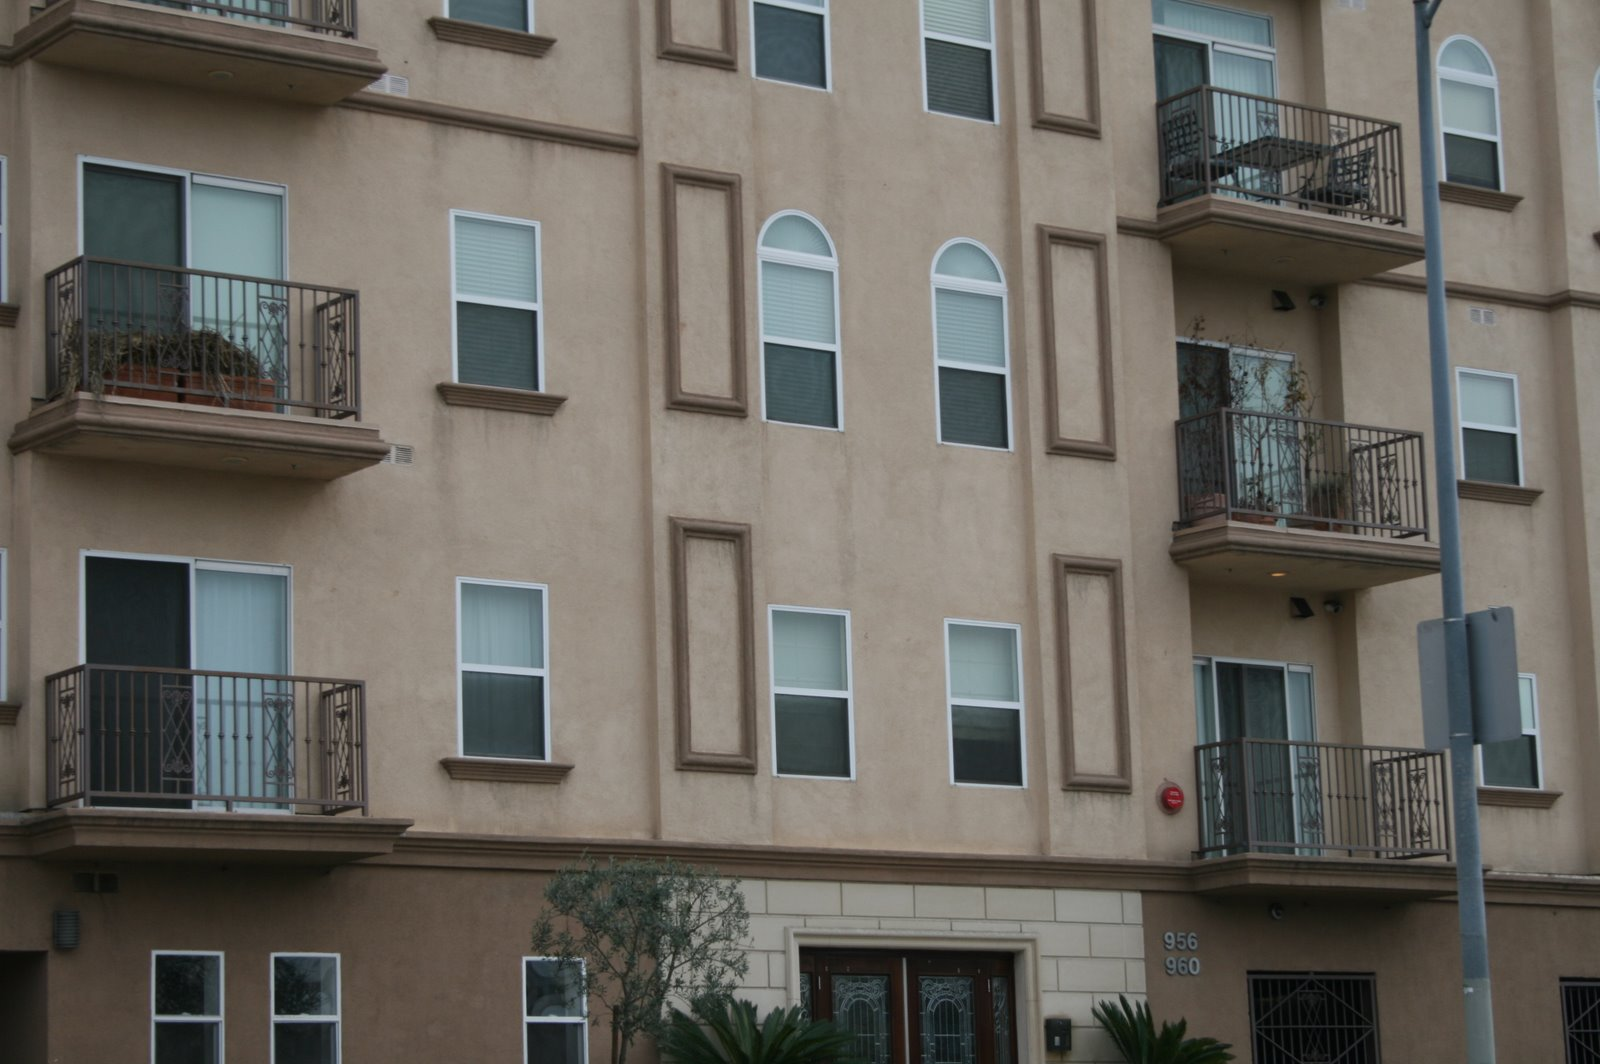 Recentering el pueblo more blind windows for New construction windows online